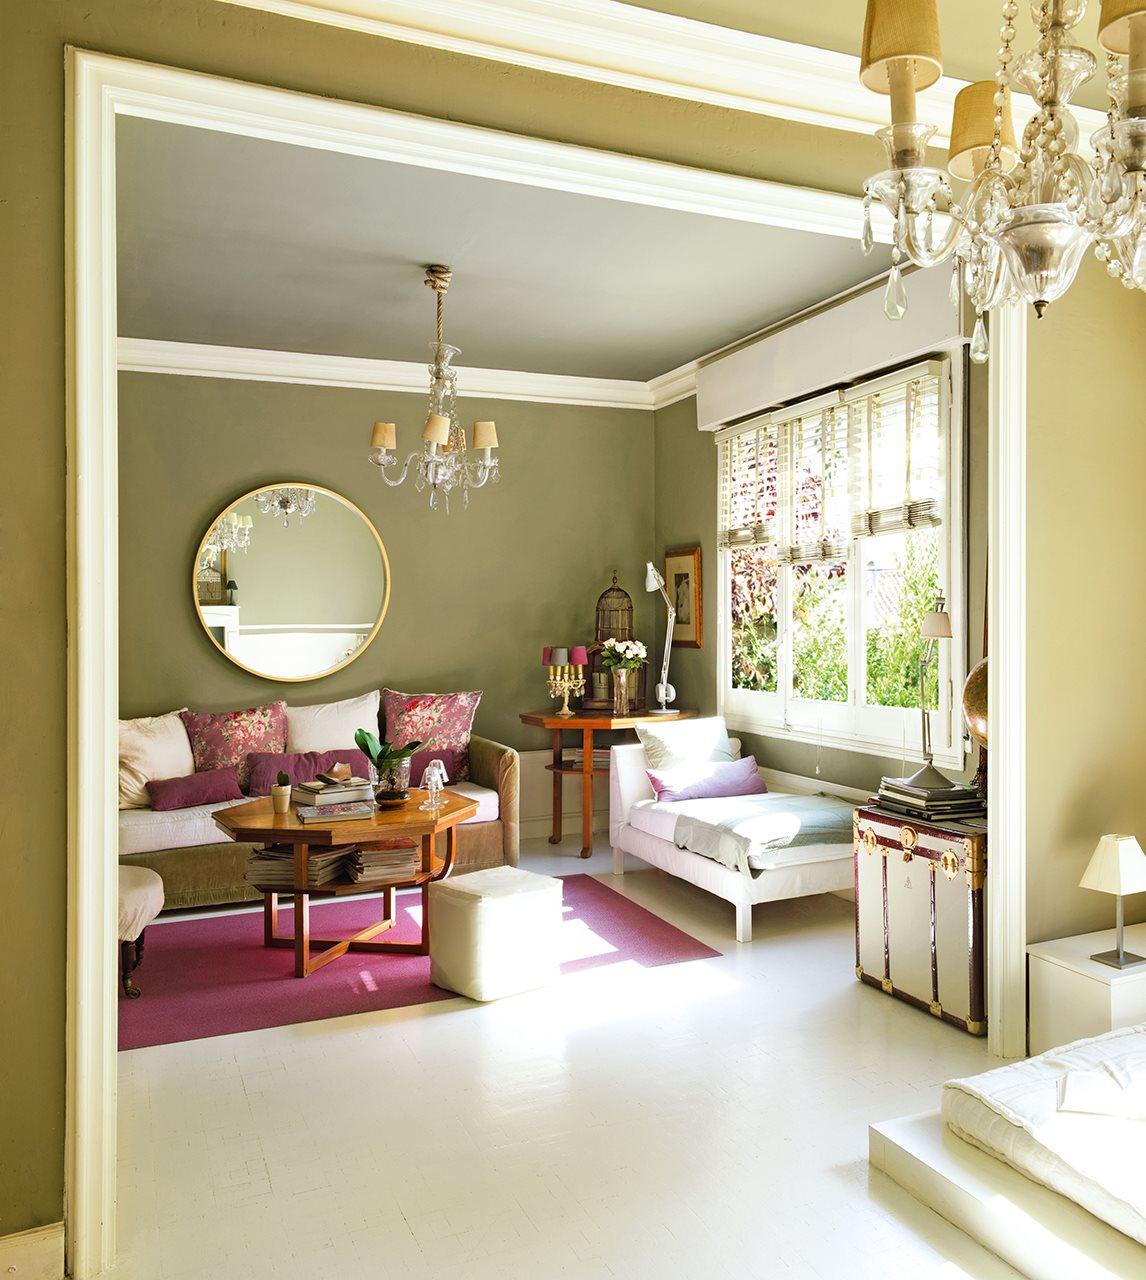 20 ideas para renovar tu casa a todo color - Casas color verde ...